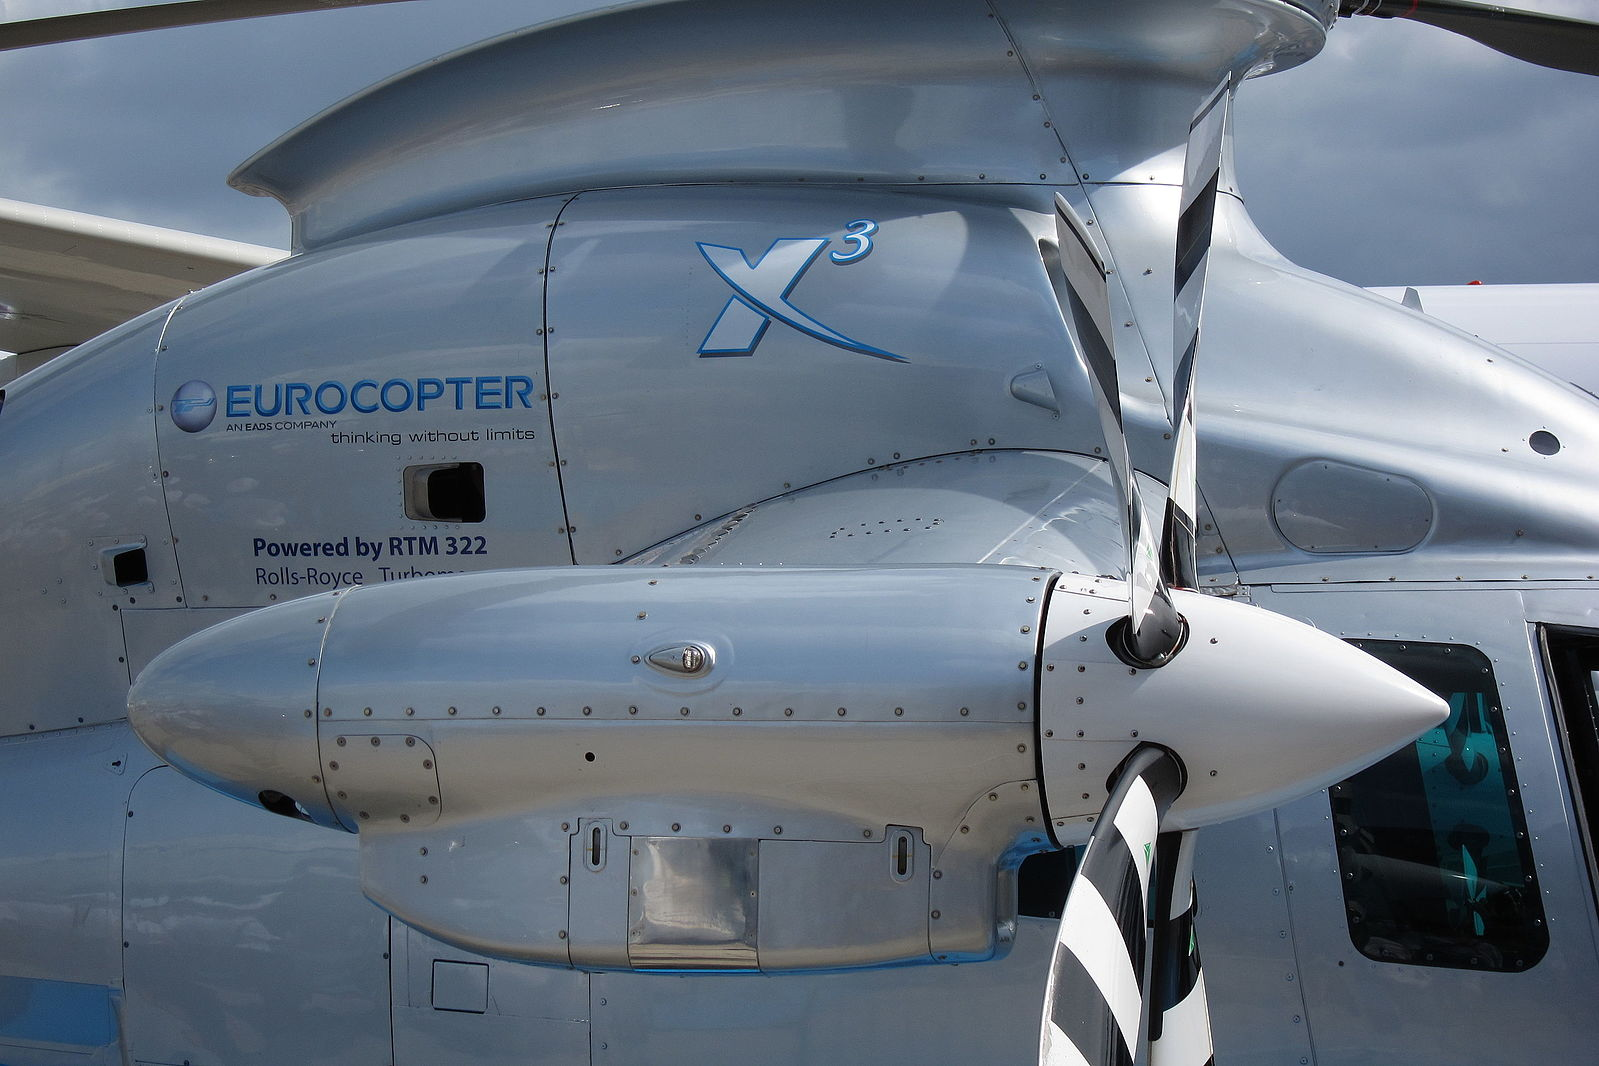 Eurocopter X3 côté